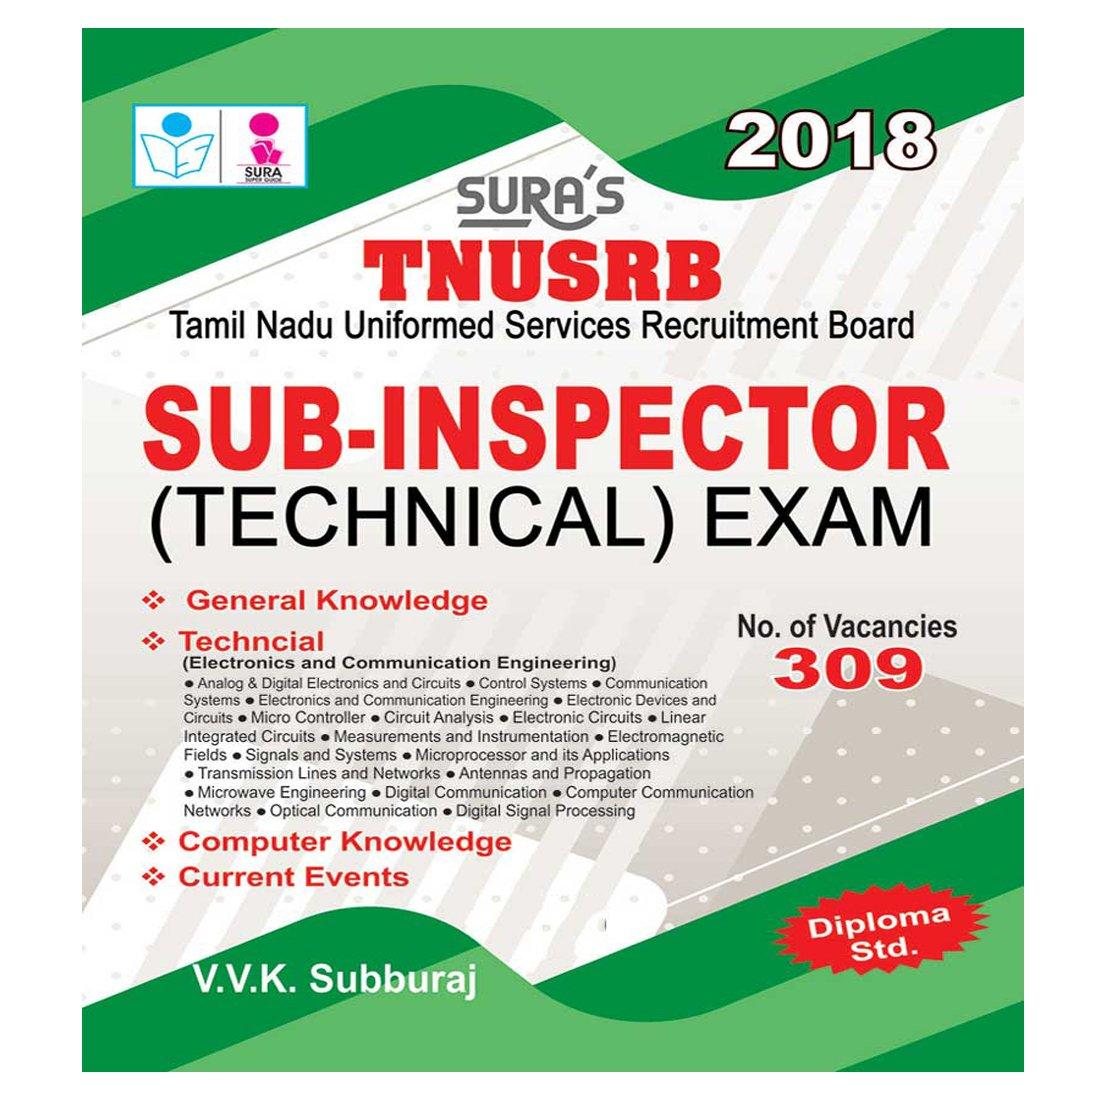 Buy TNUSRB Sub-Inspectors SI (Technical) Exam English Books